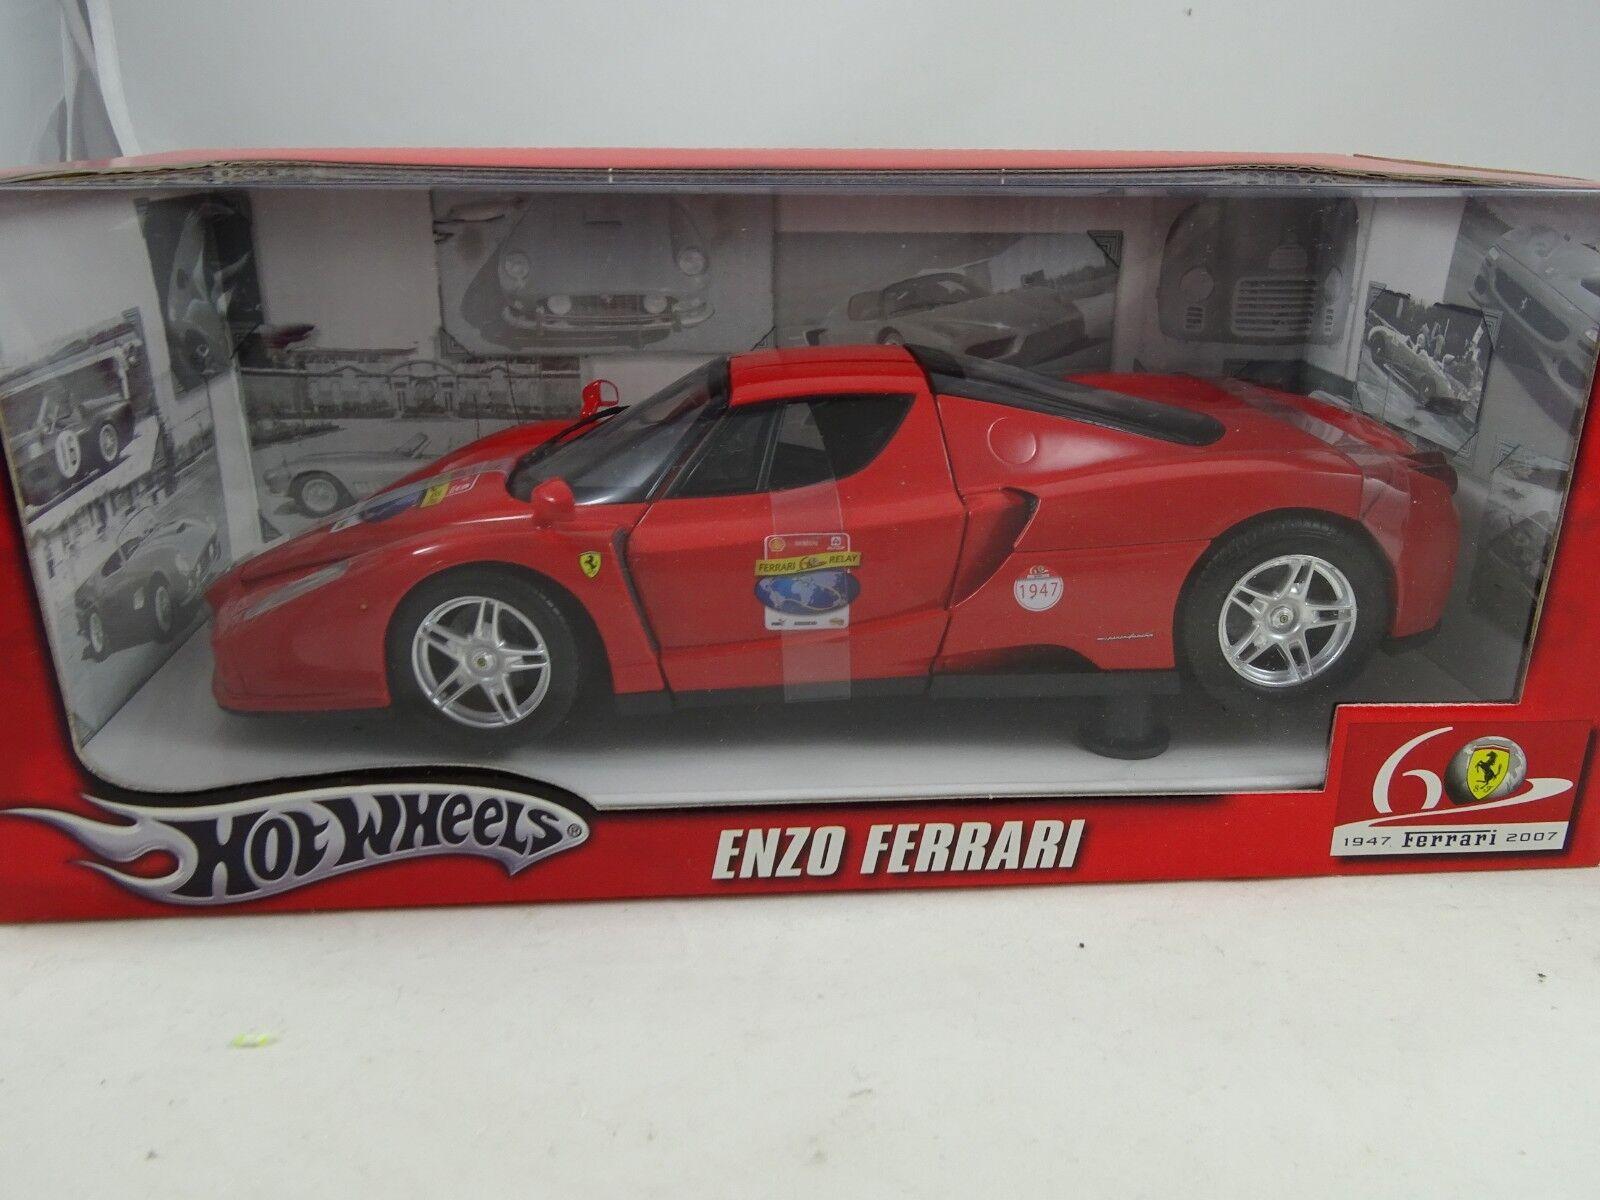 n ° 1 en línea 1 18 Hot Wheels  L2968 L2968 L2968 Enzo Ferrari 60 Aniversario Rojo - Rareza  descuento